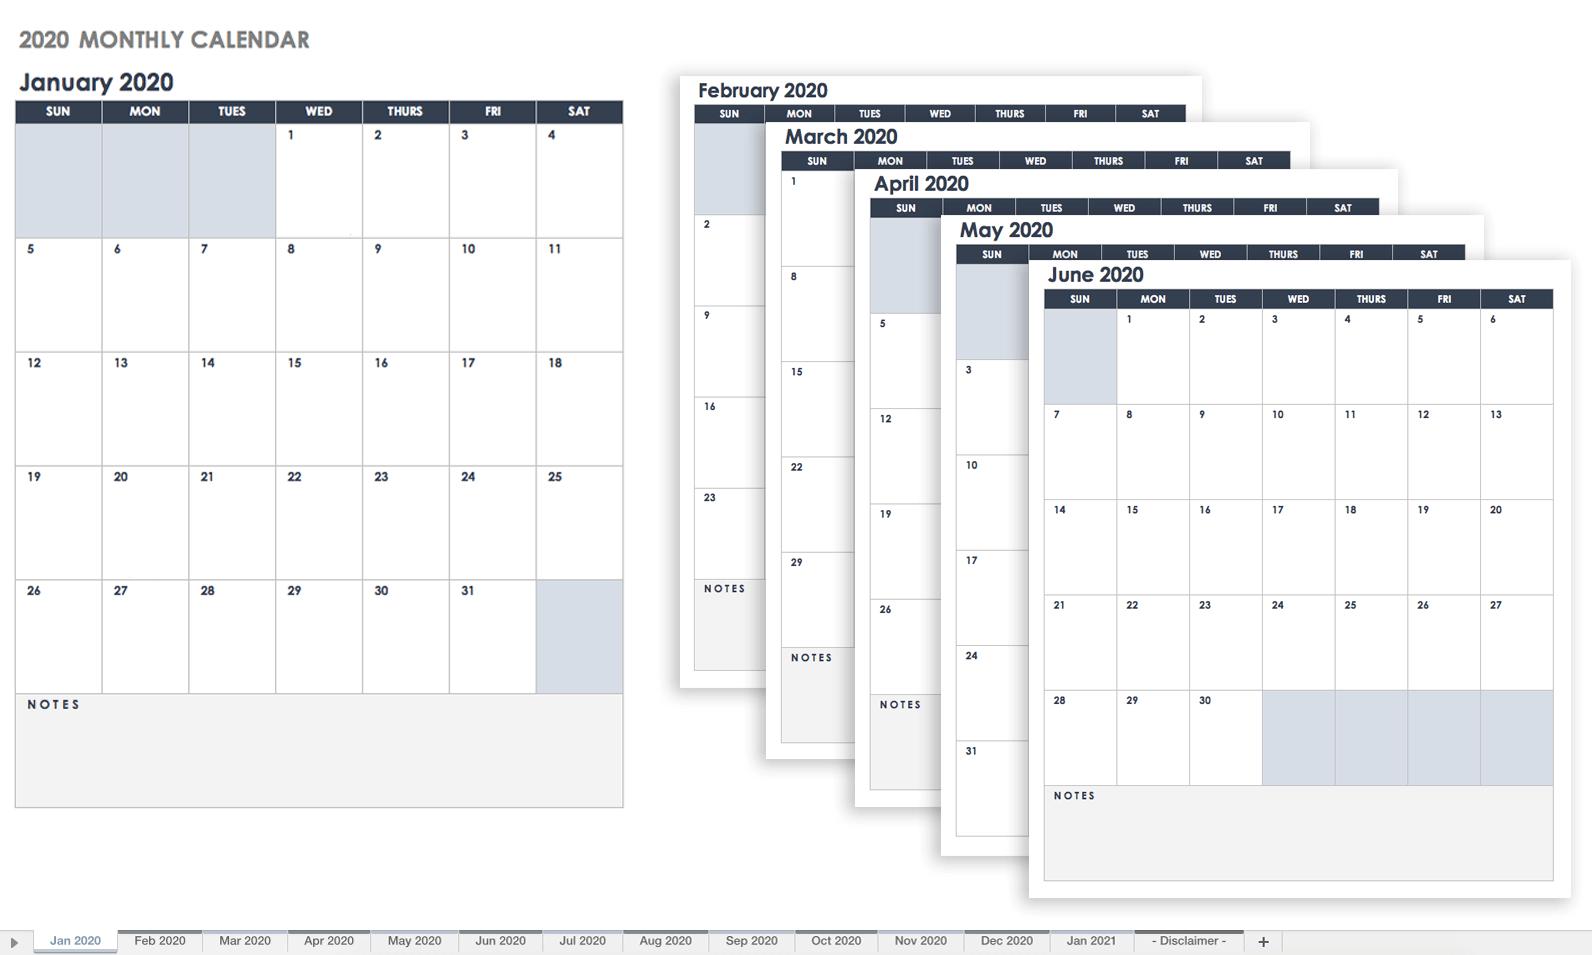 Free Google Calendar Templates   Smartsheet inside 2020 Calendar Time And Date